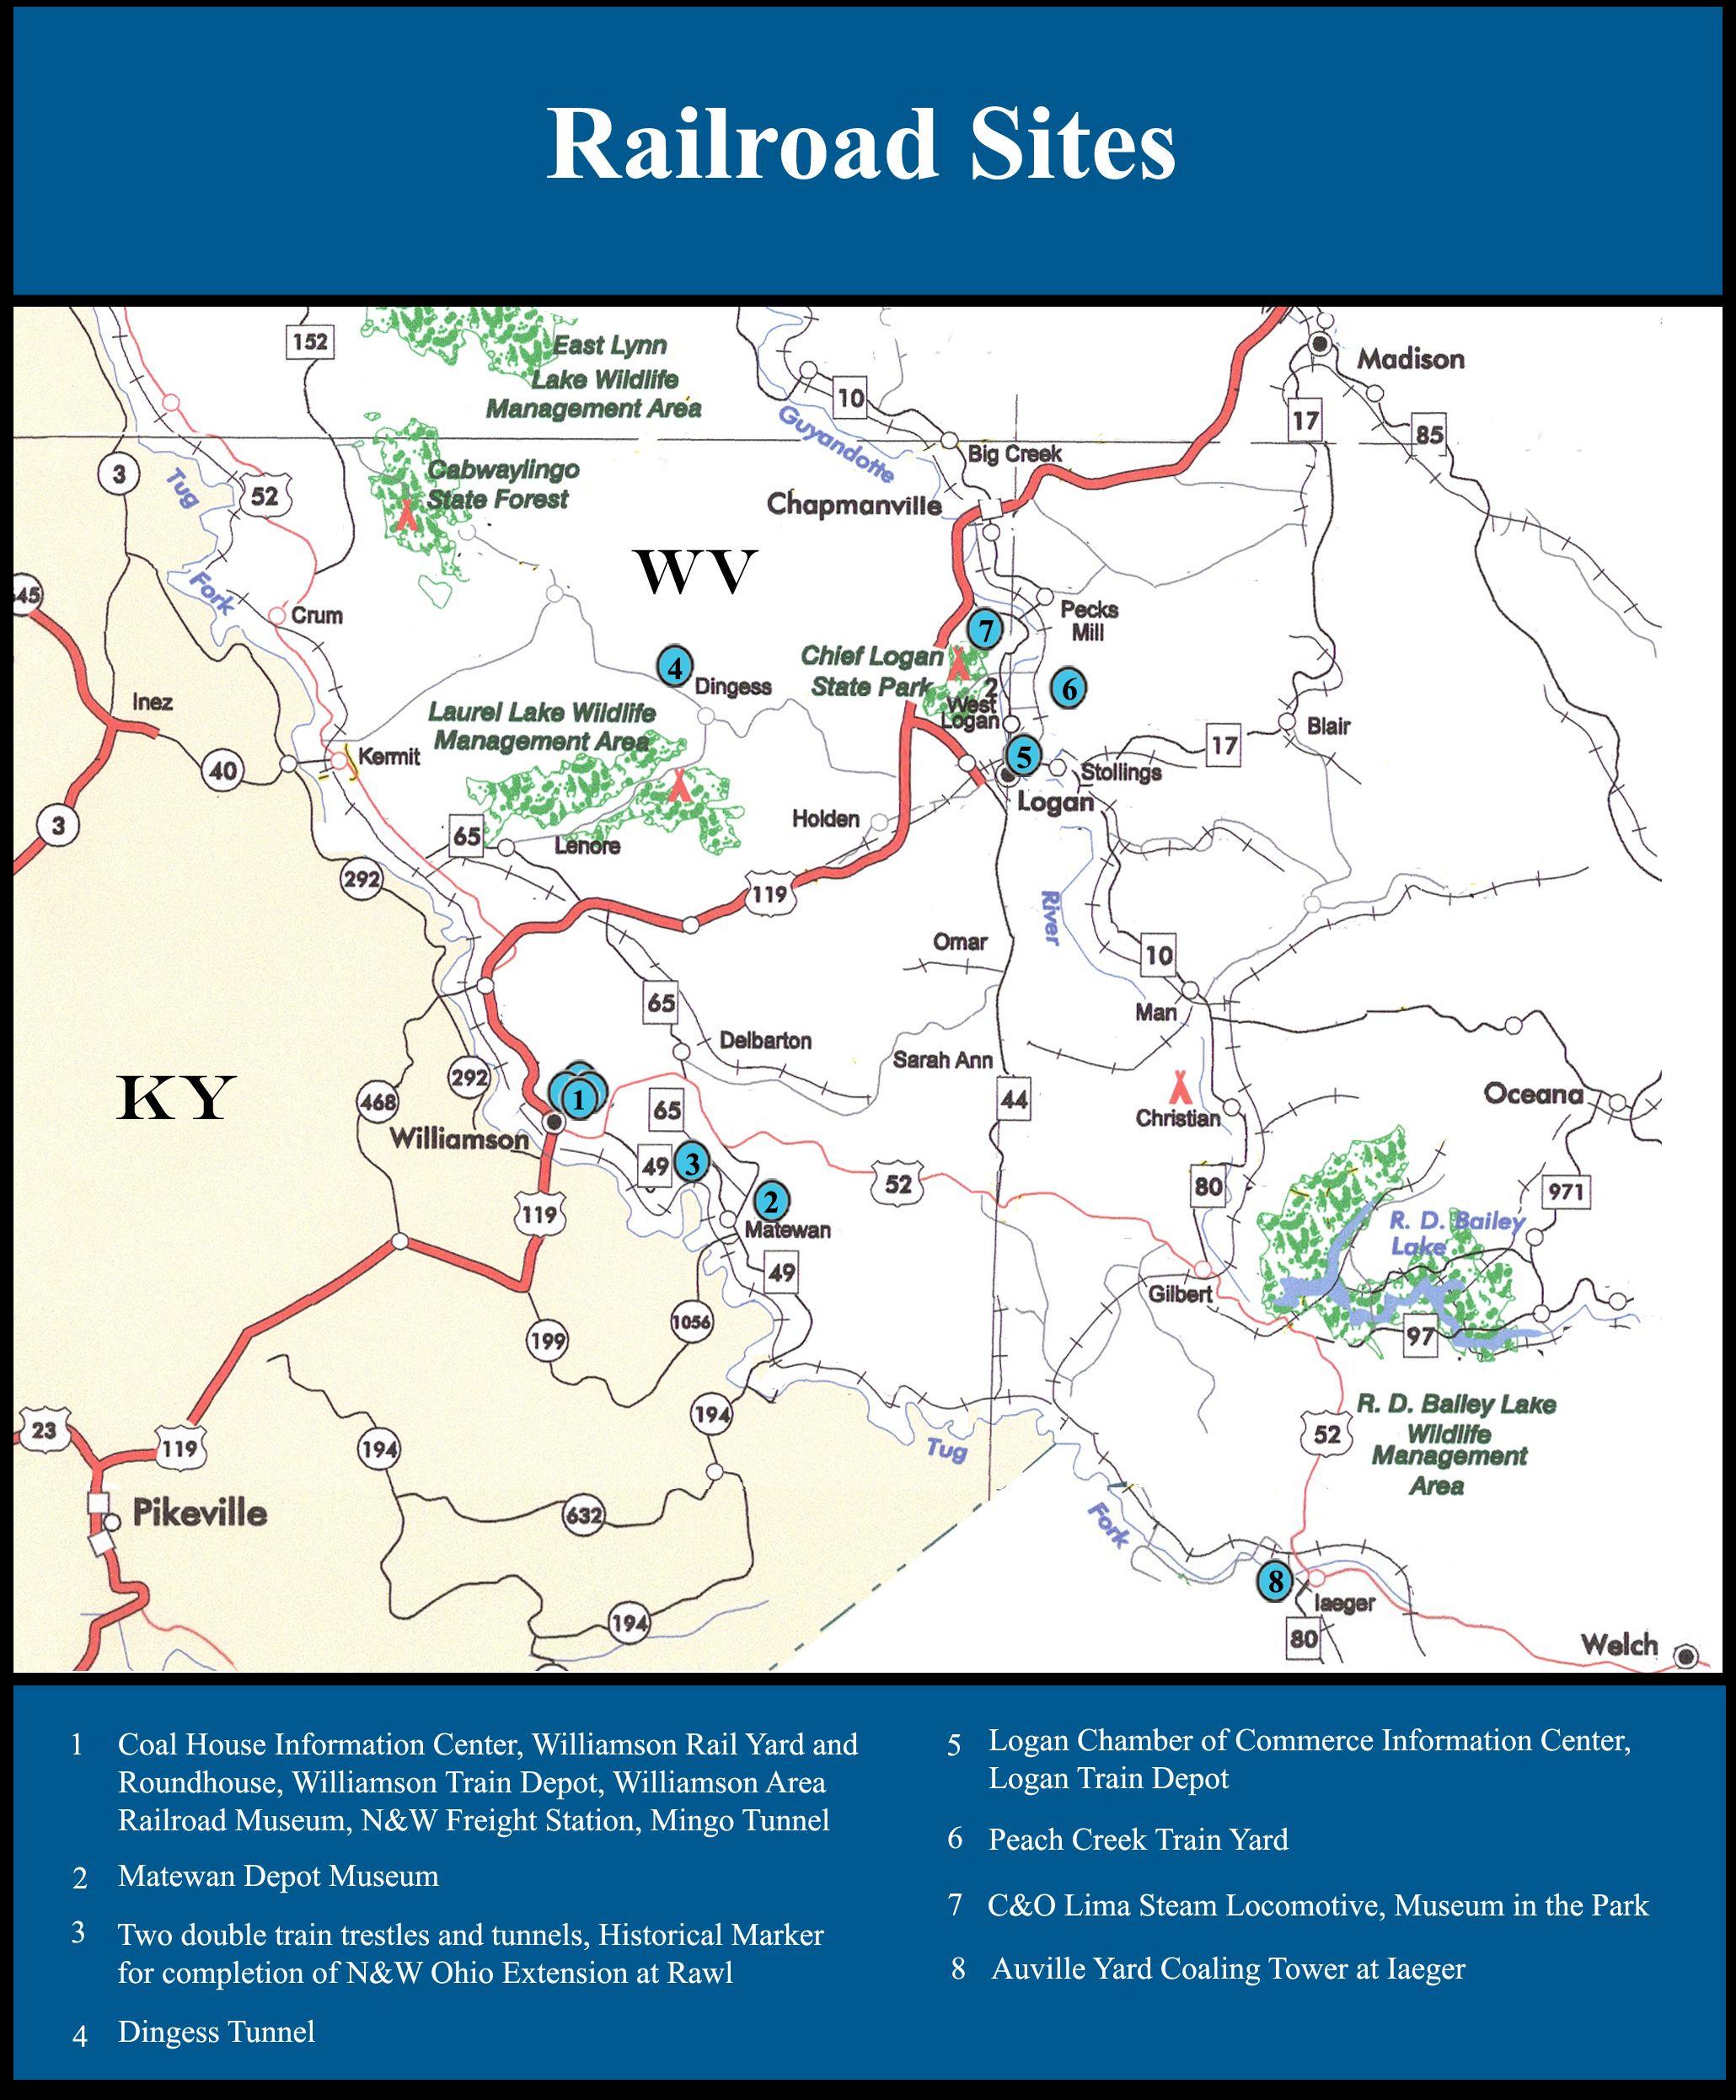 Hatfield And Mccoy Area Maps Hatfield Mccoy Country Area Map Laurel Lake Hatfields And Mccoys